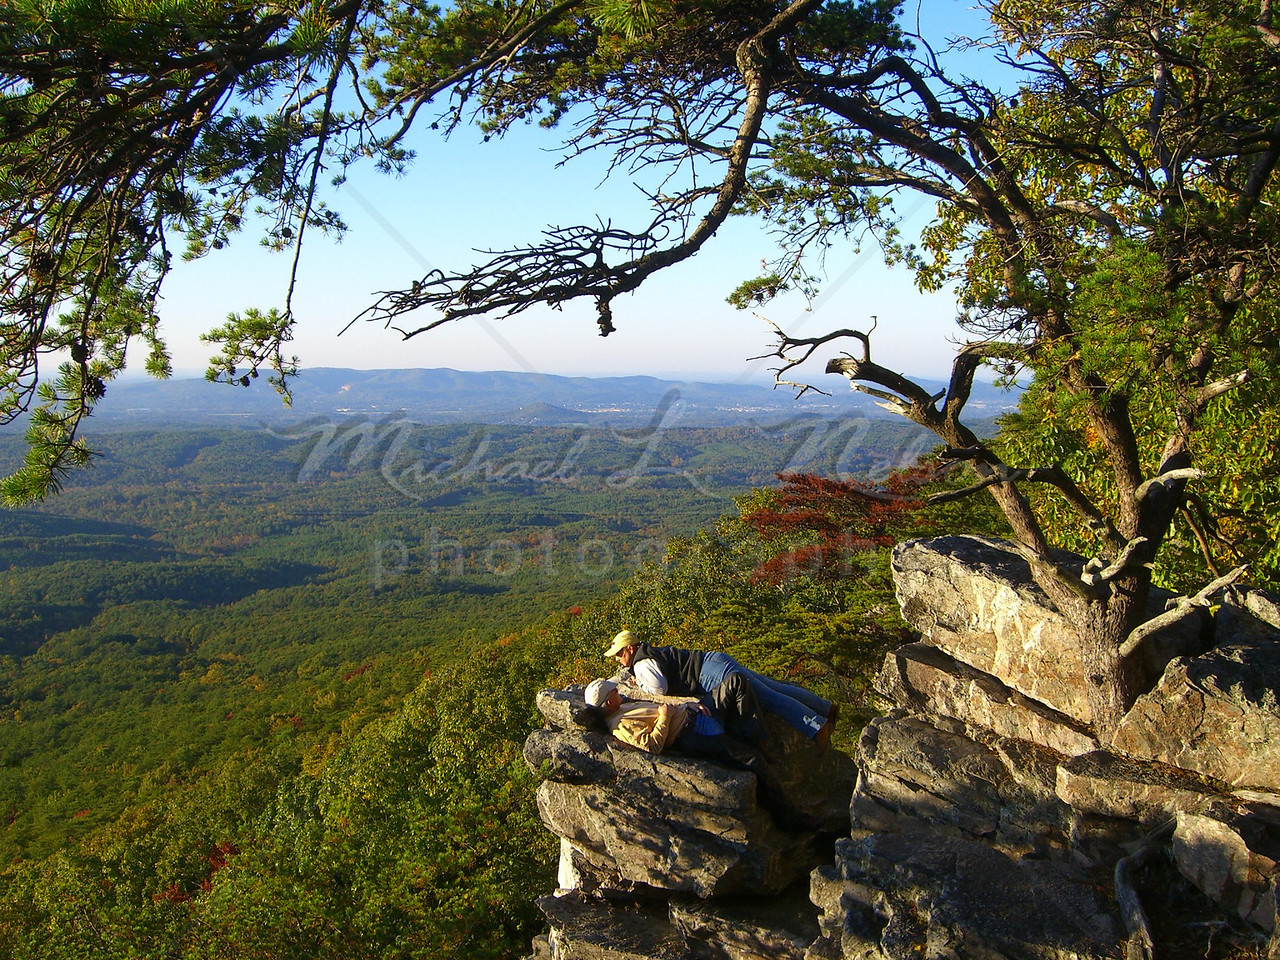 Mount Cheaha, Alabama